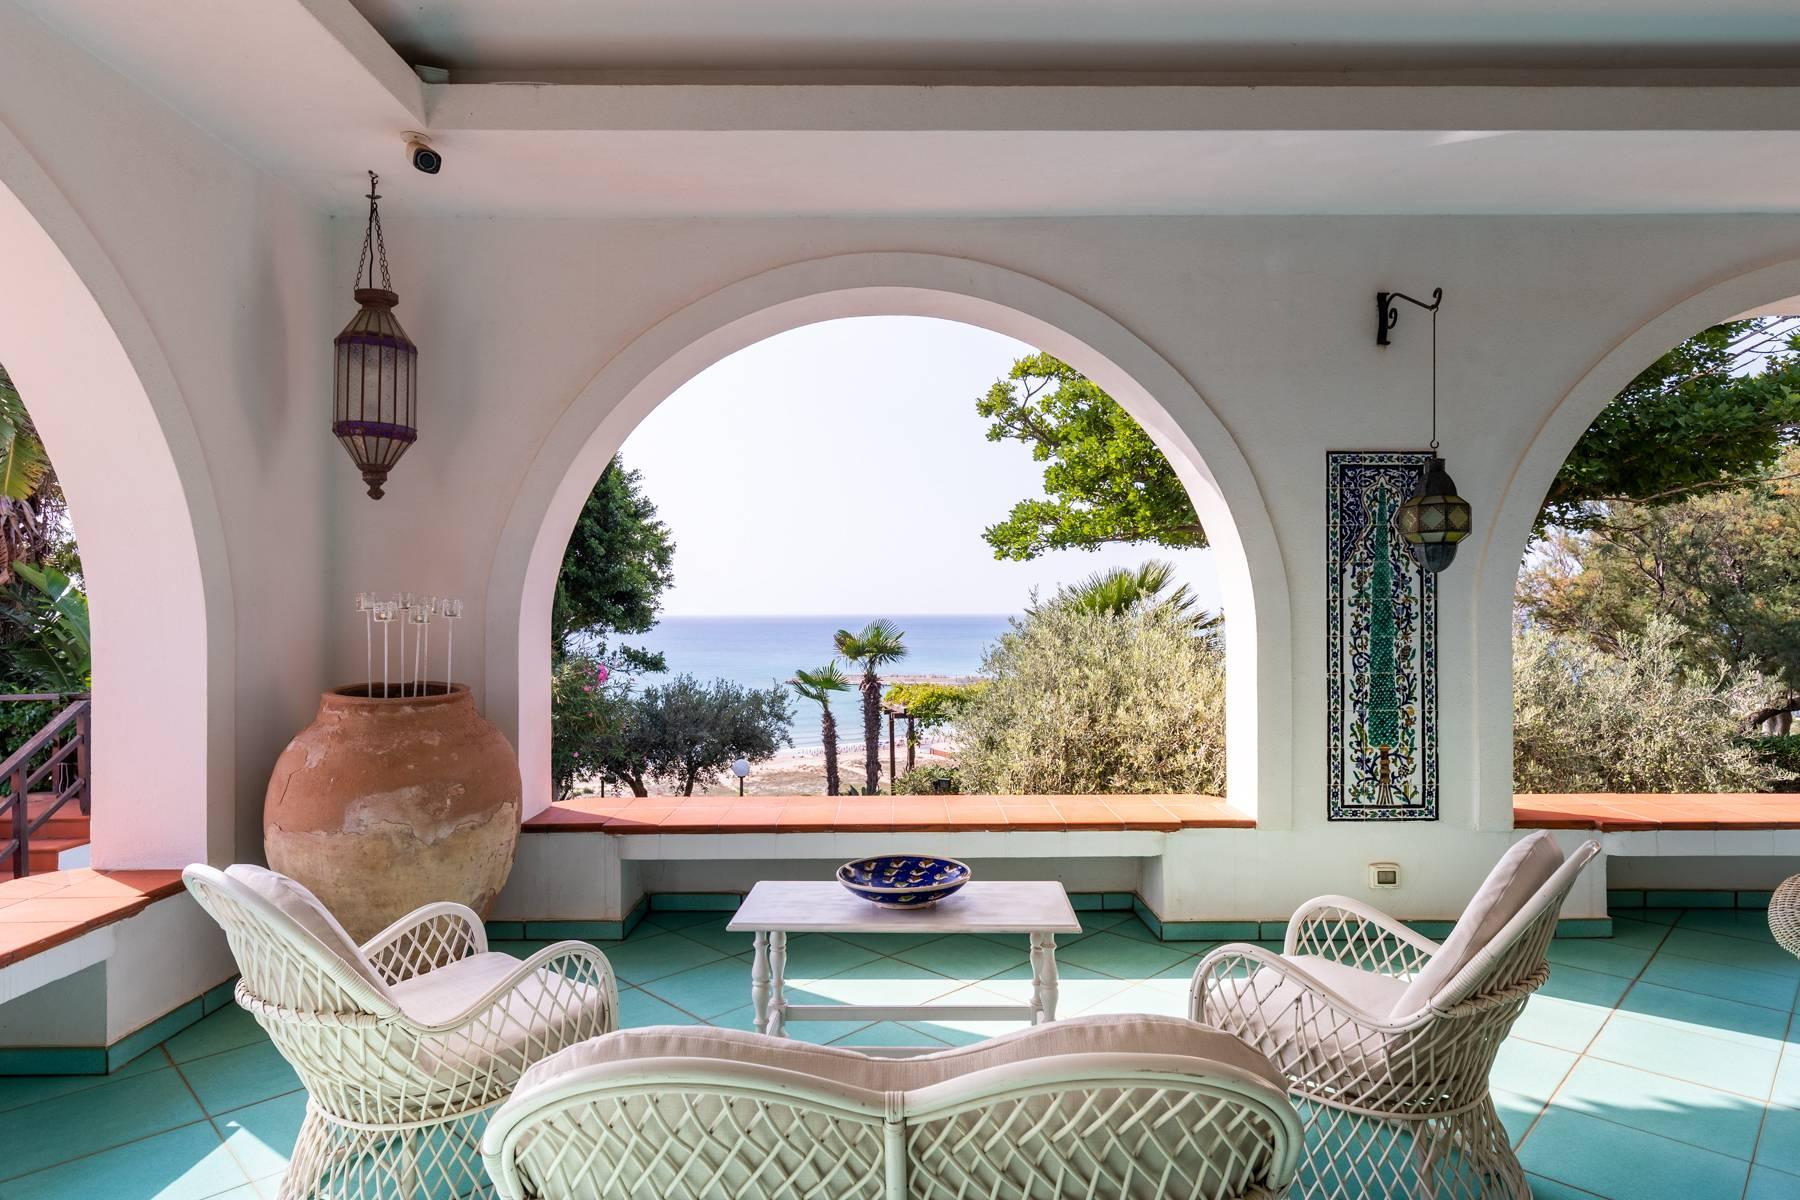 Sizilianische Villa am Mittel Meer - 2